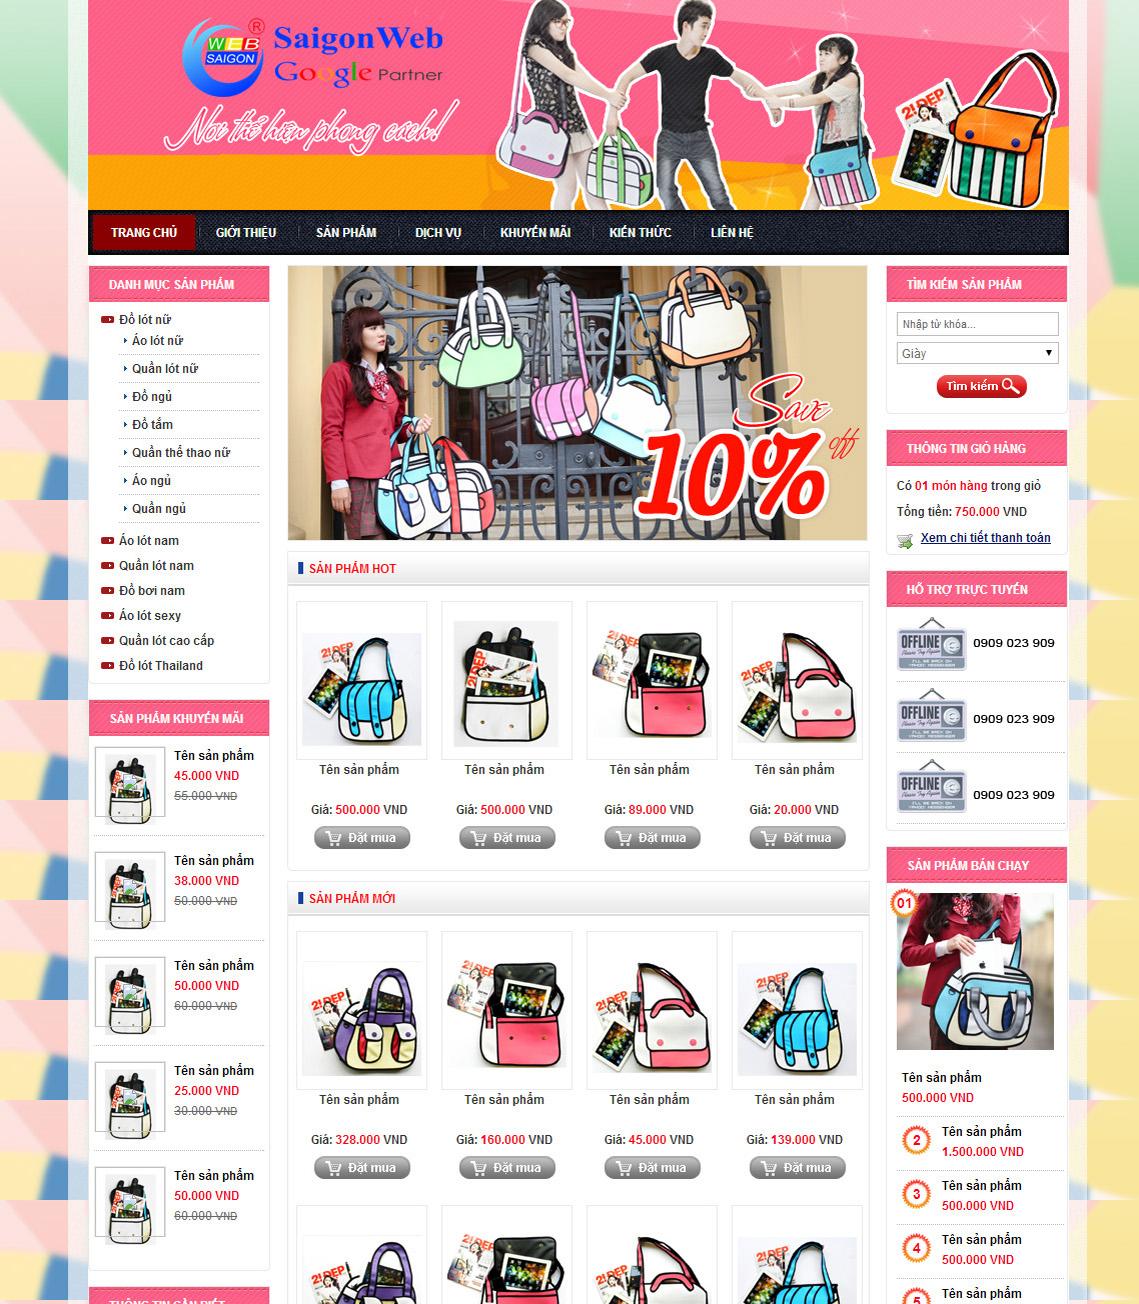 website thời trang21